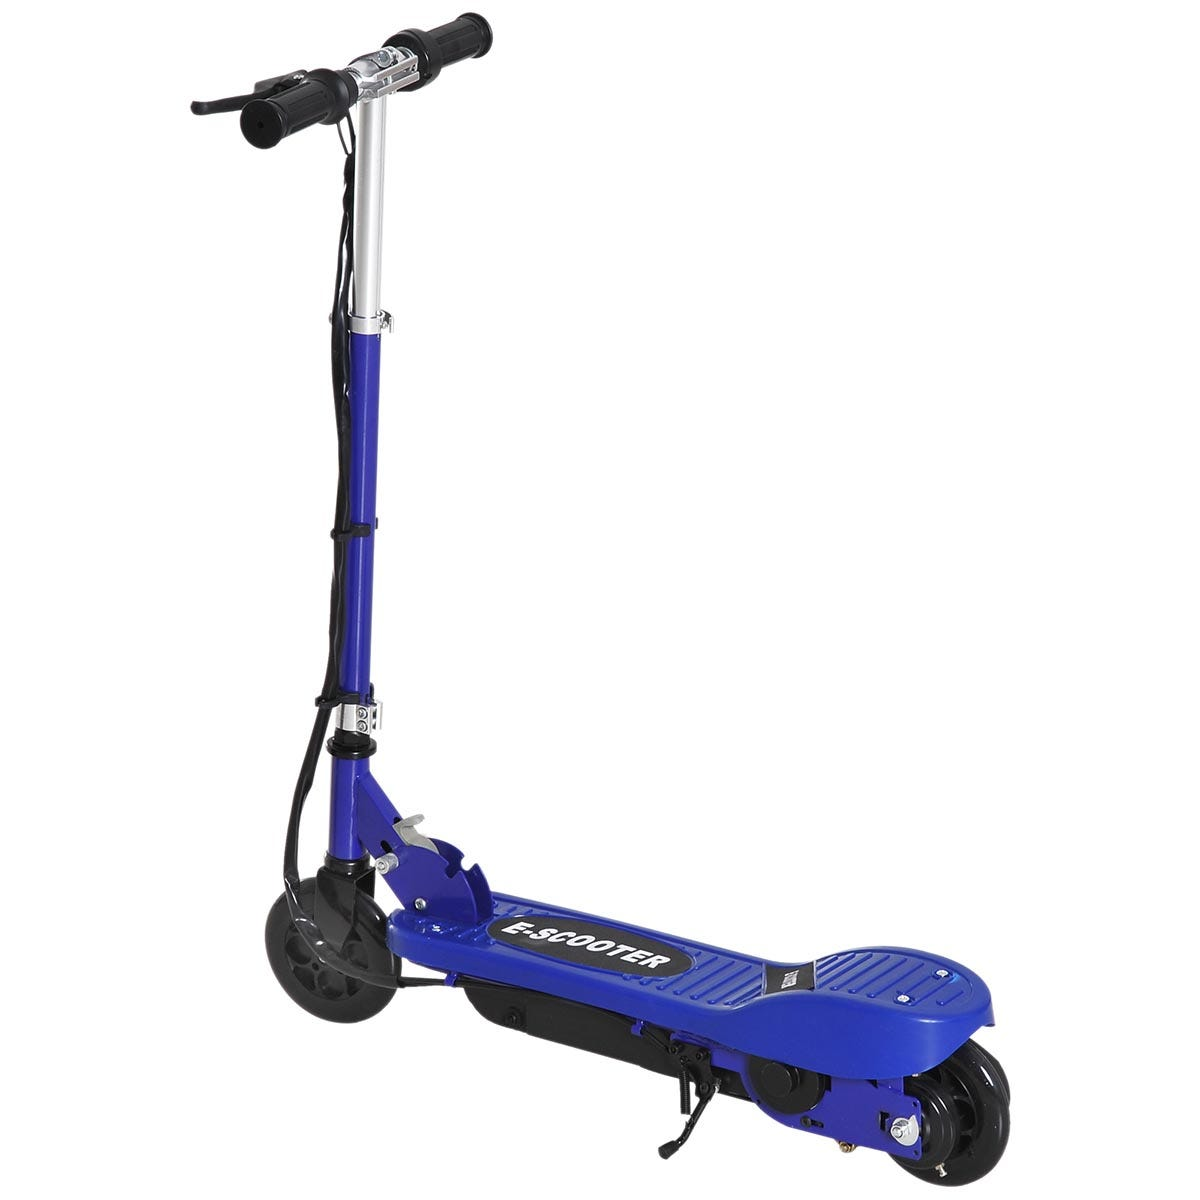 Reiten Folding Kids Electric Scooter 7-14 Adjustable Battery Power PU Wheels - Blue